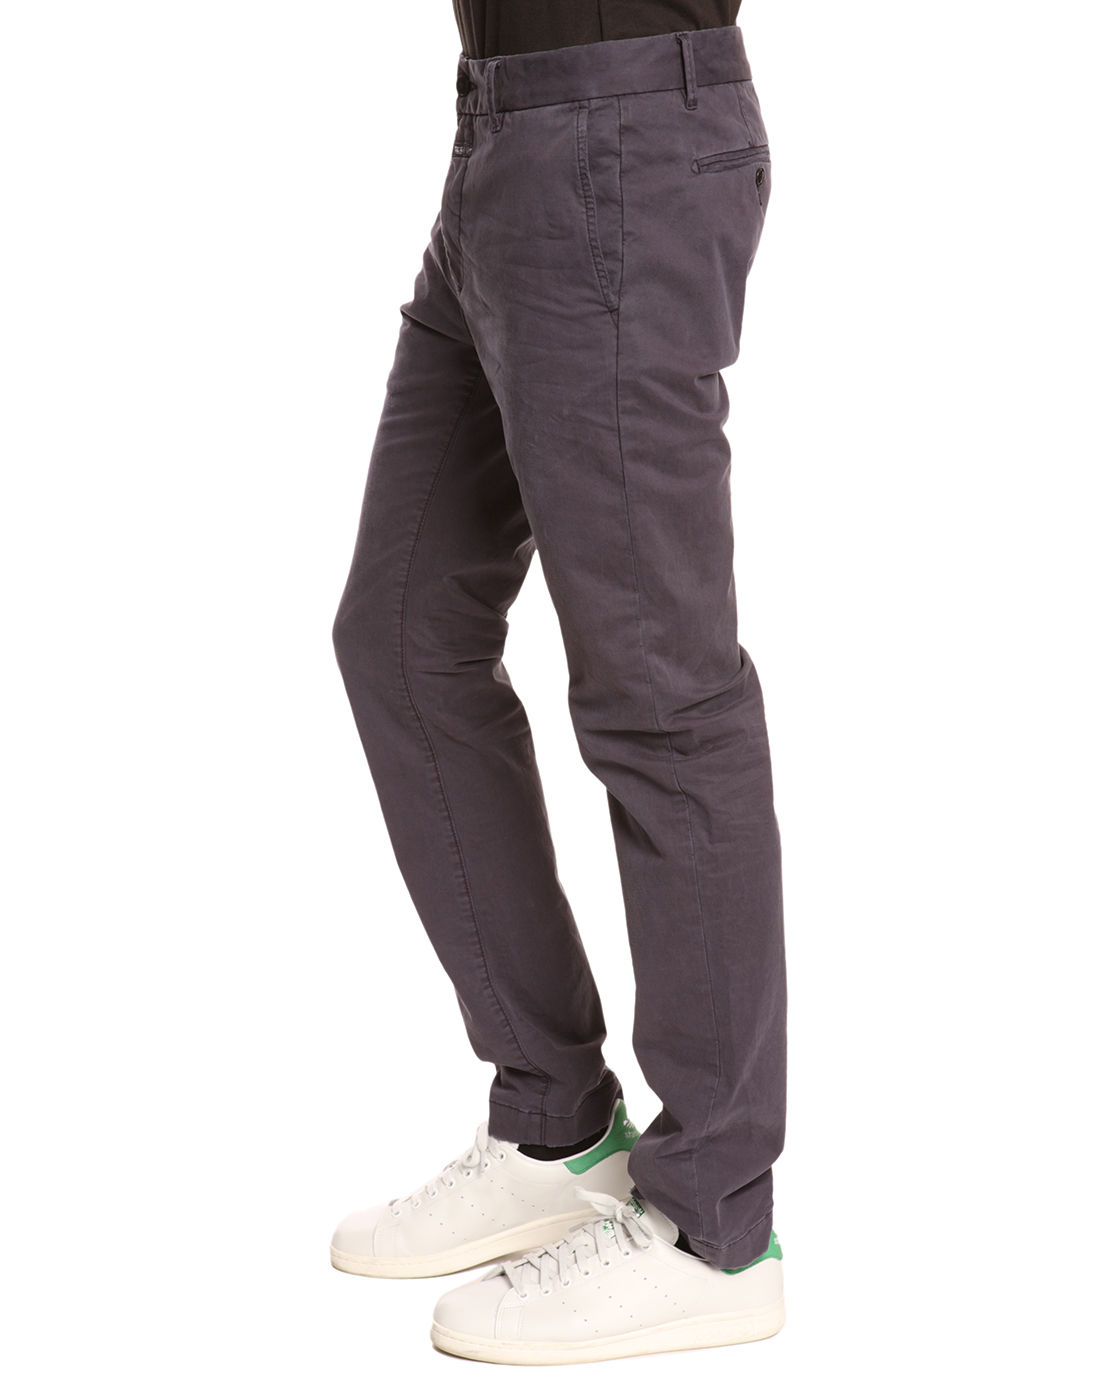 Chinos pants blue